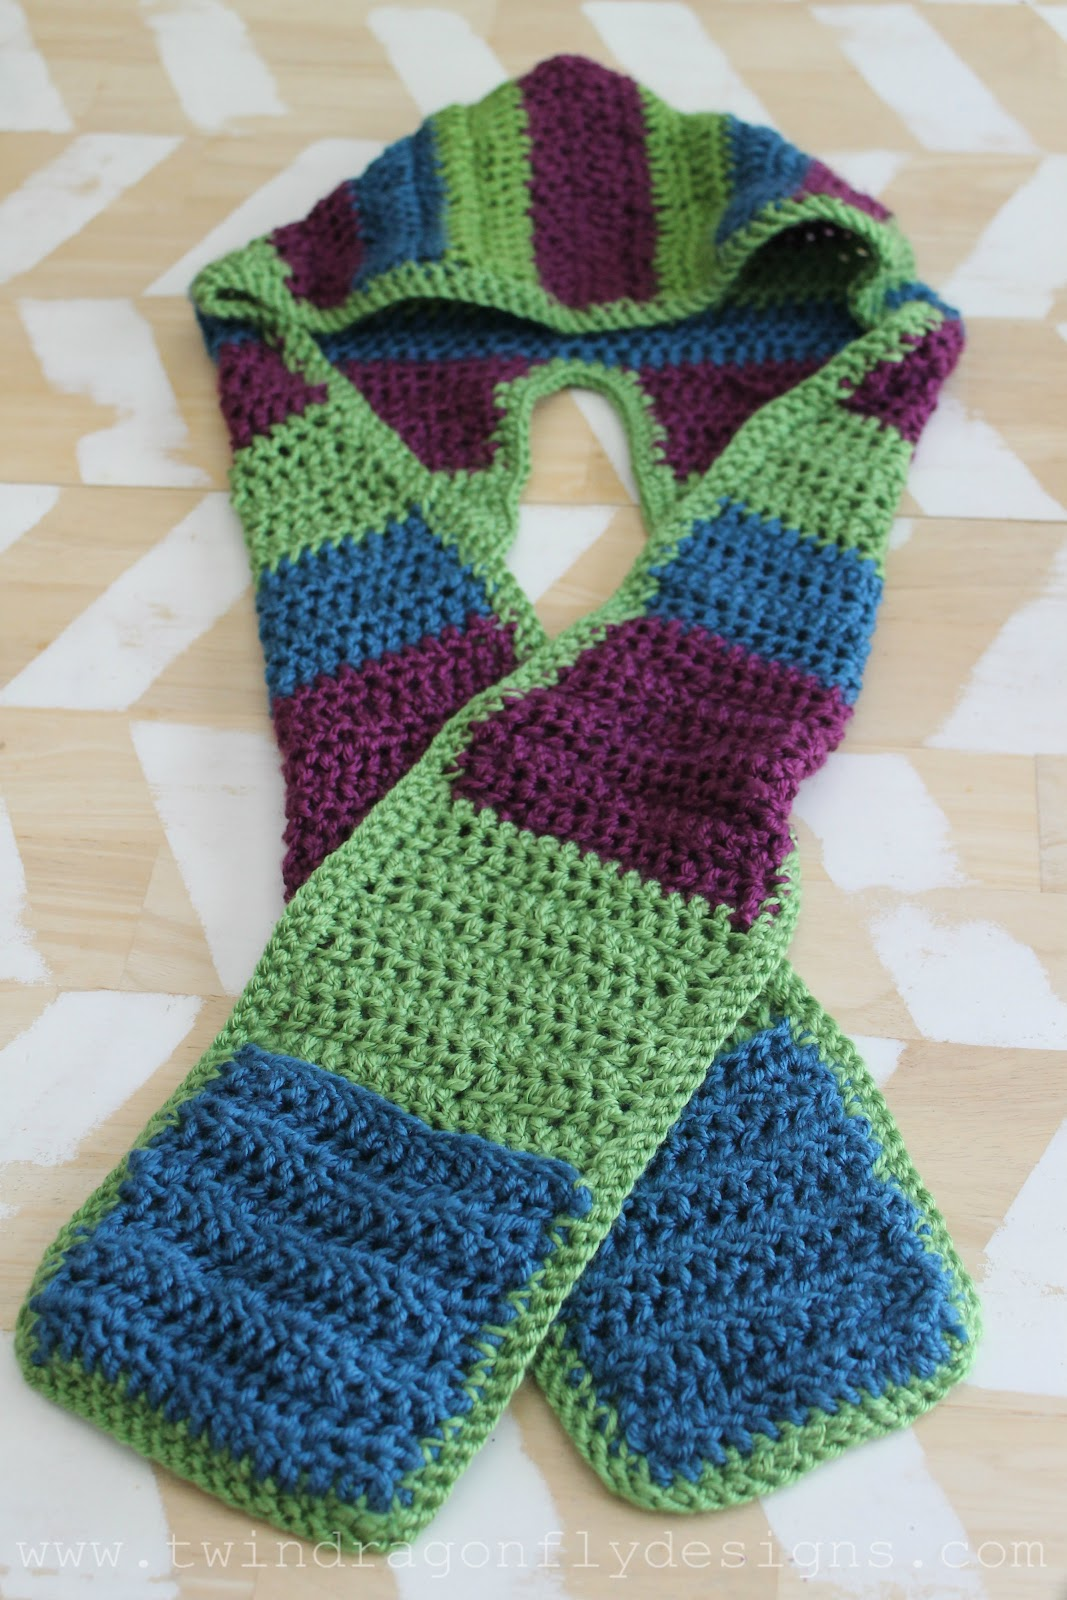 Crochet Hooded Scarf Pattern  U00bb Dragonfly Designs